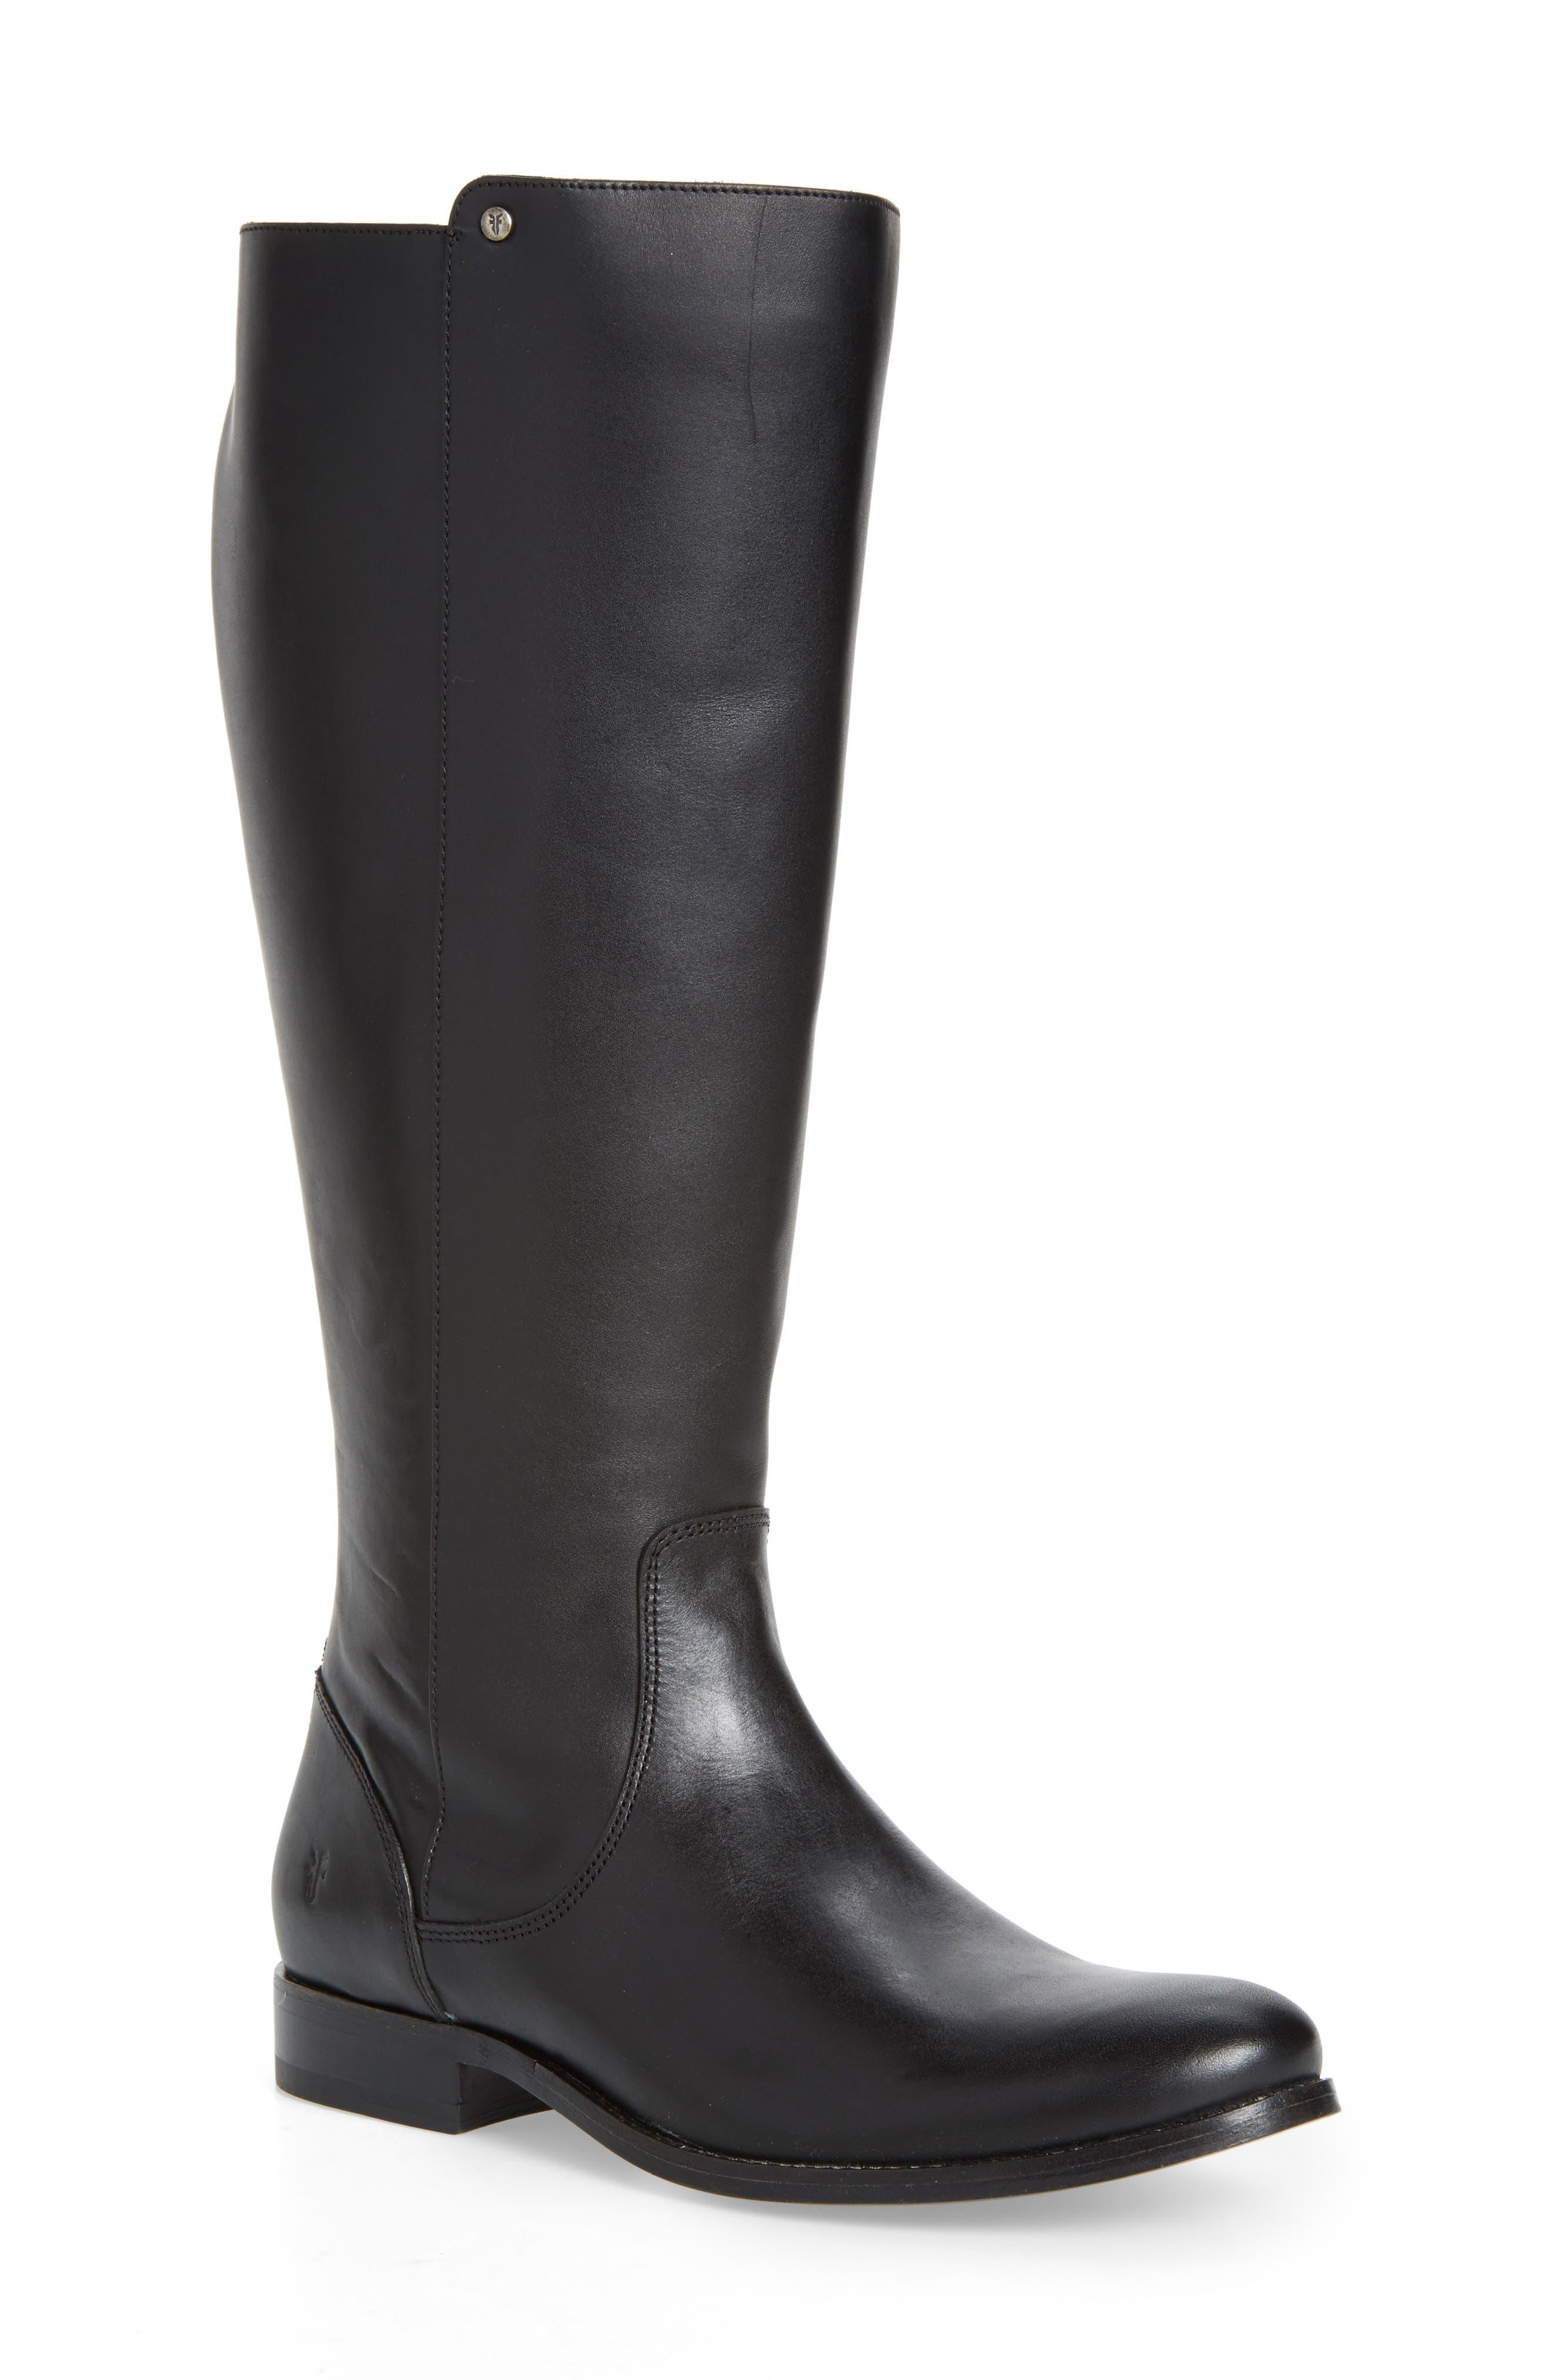 Melissa Stud Knee High Boot,                             Main thumbnail 1, color,                             015